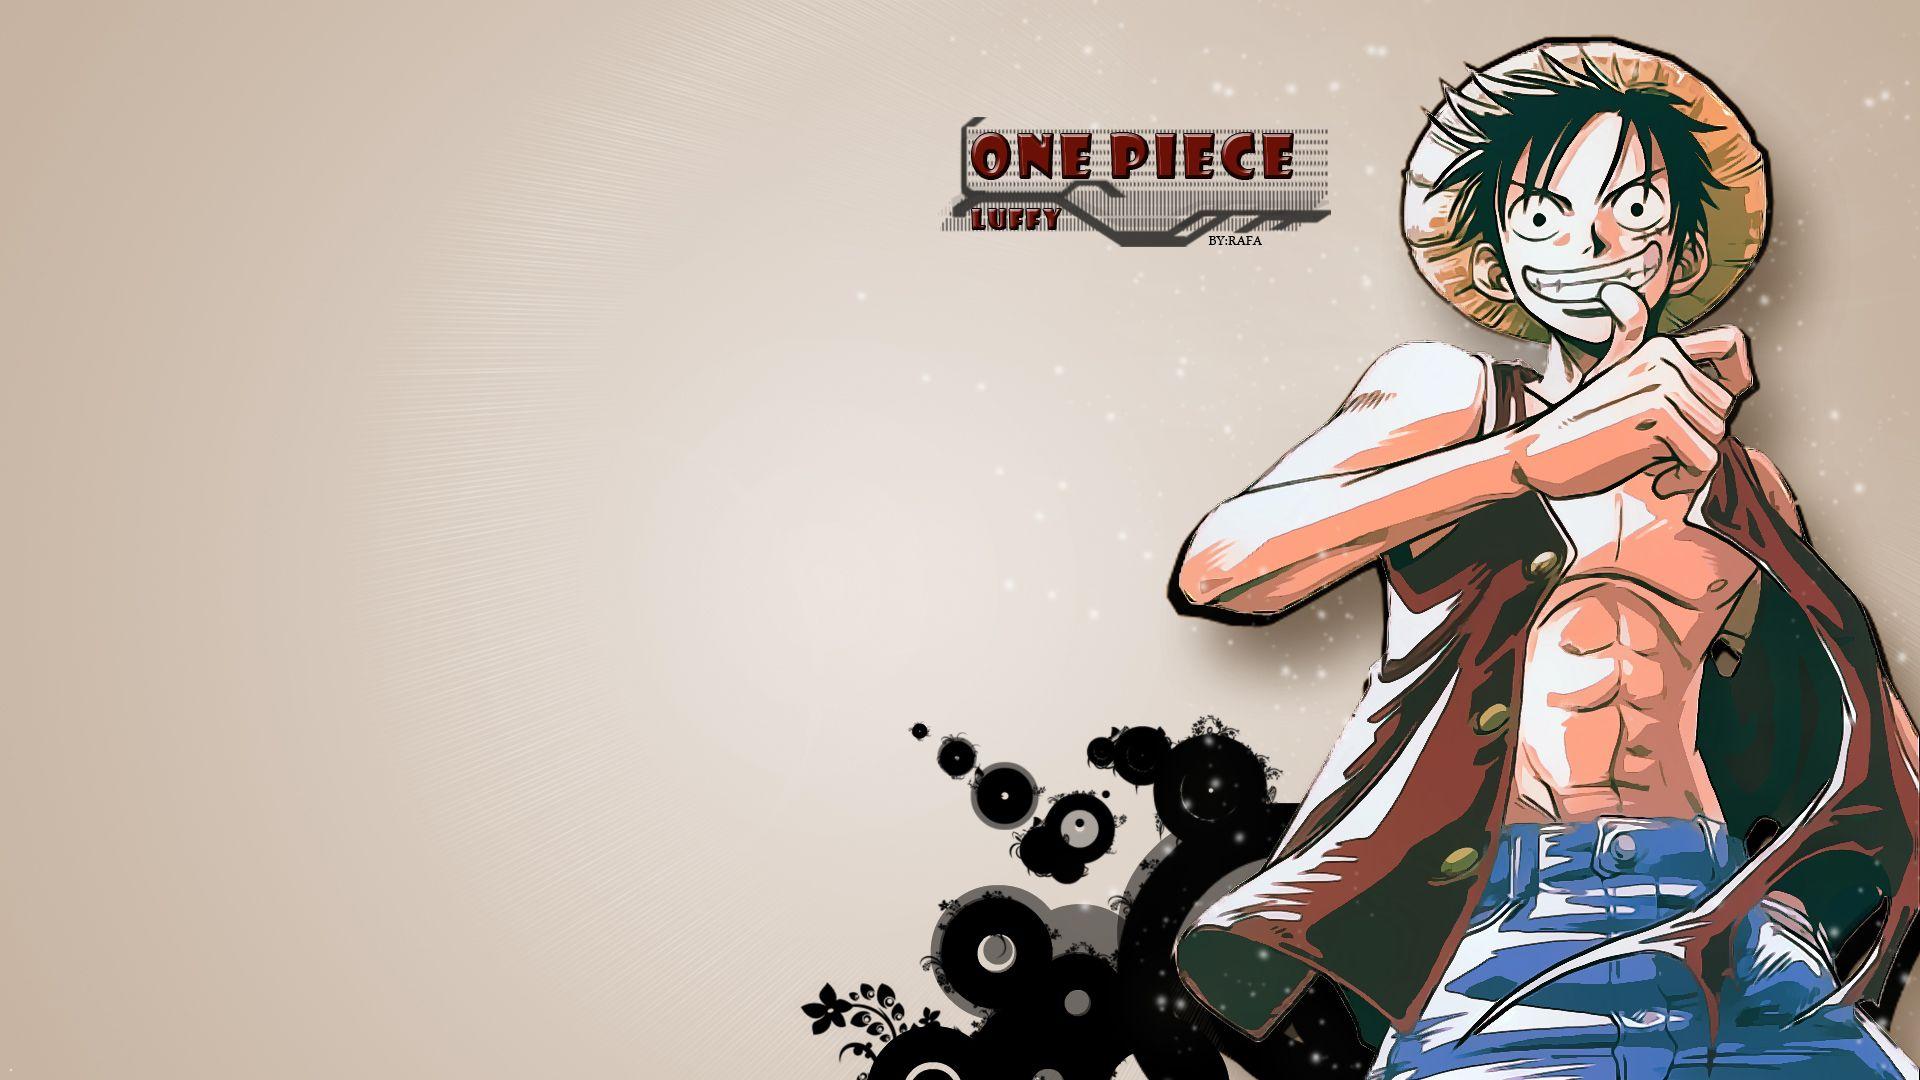 One Piece Wallpaper Widescreen One Piece New World One